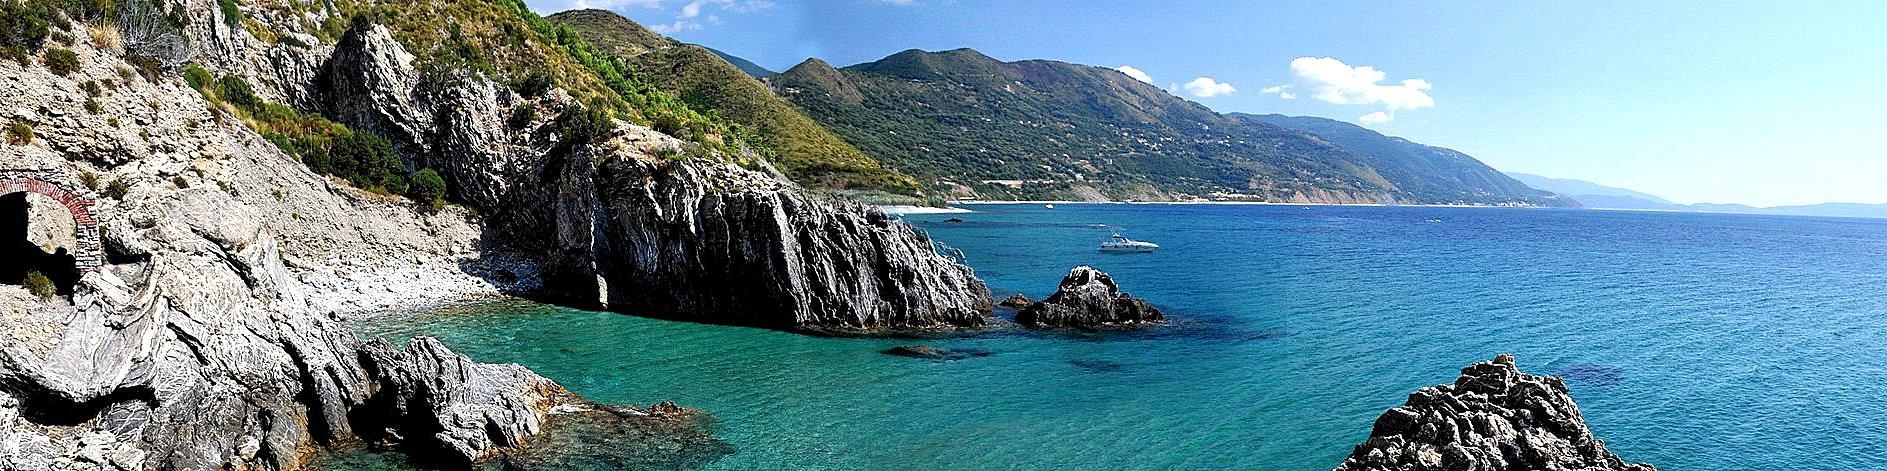 Ascea Marina, skály na pokraji zátoky